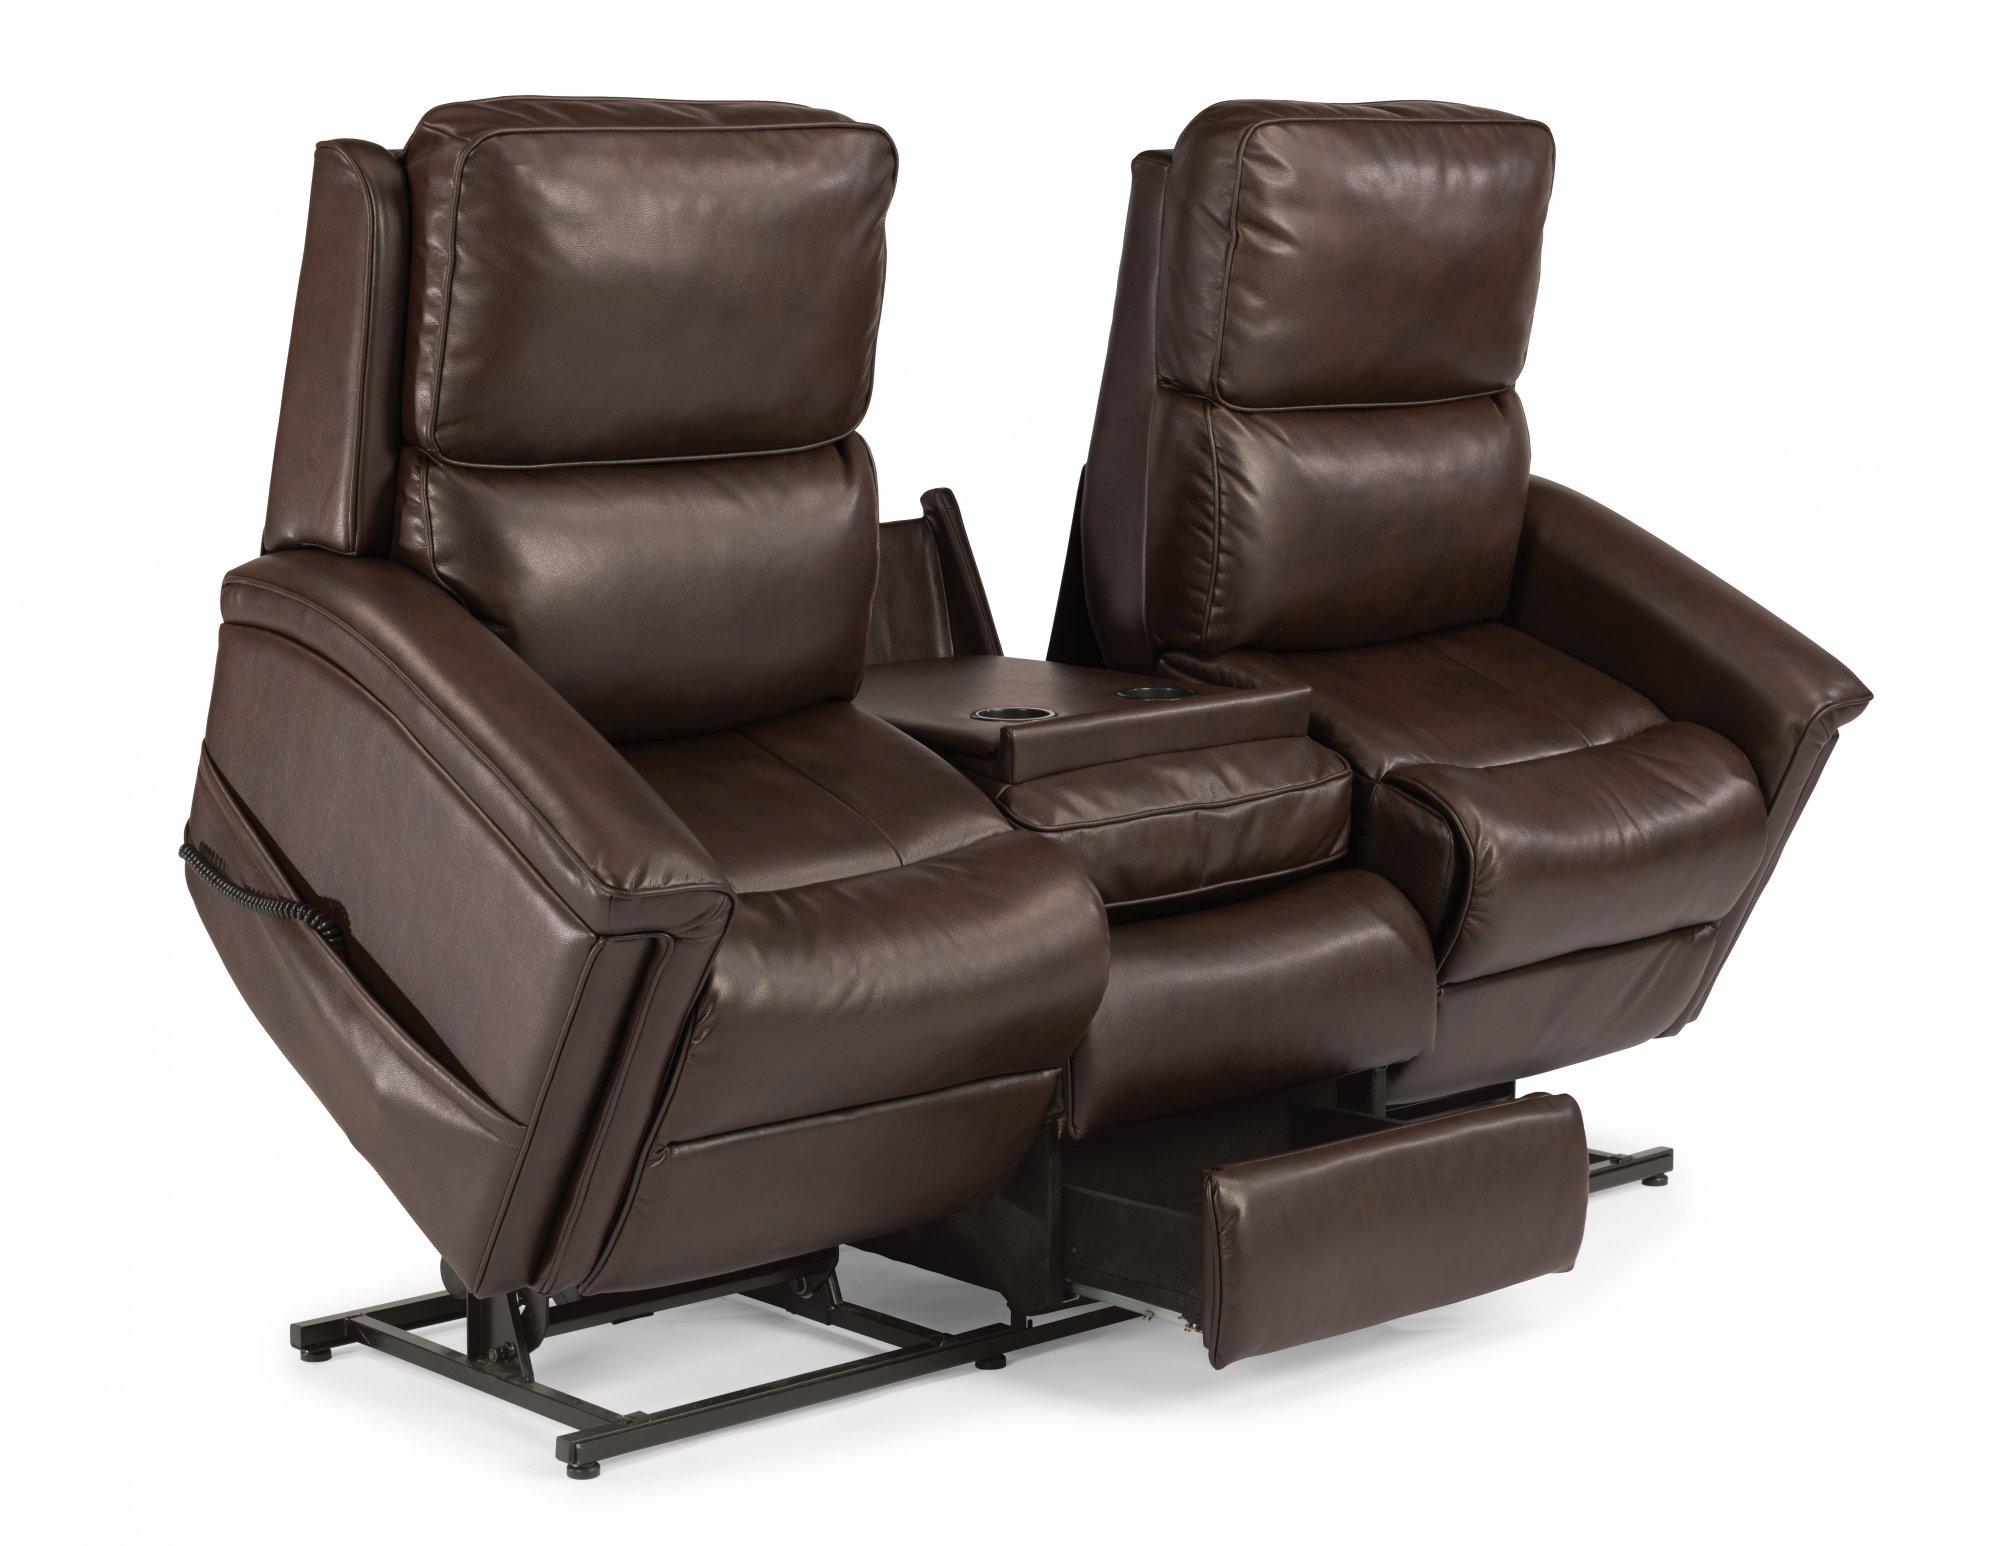 Fabric Lift Reclining Sofa. Lift Reclining Furniture   Flexsteel com